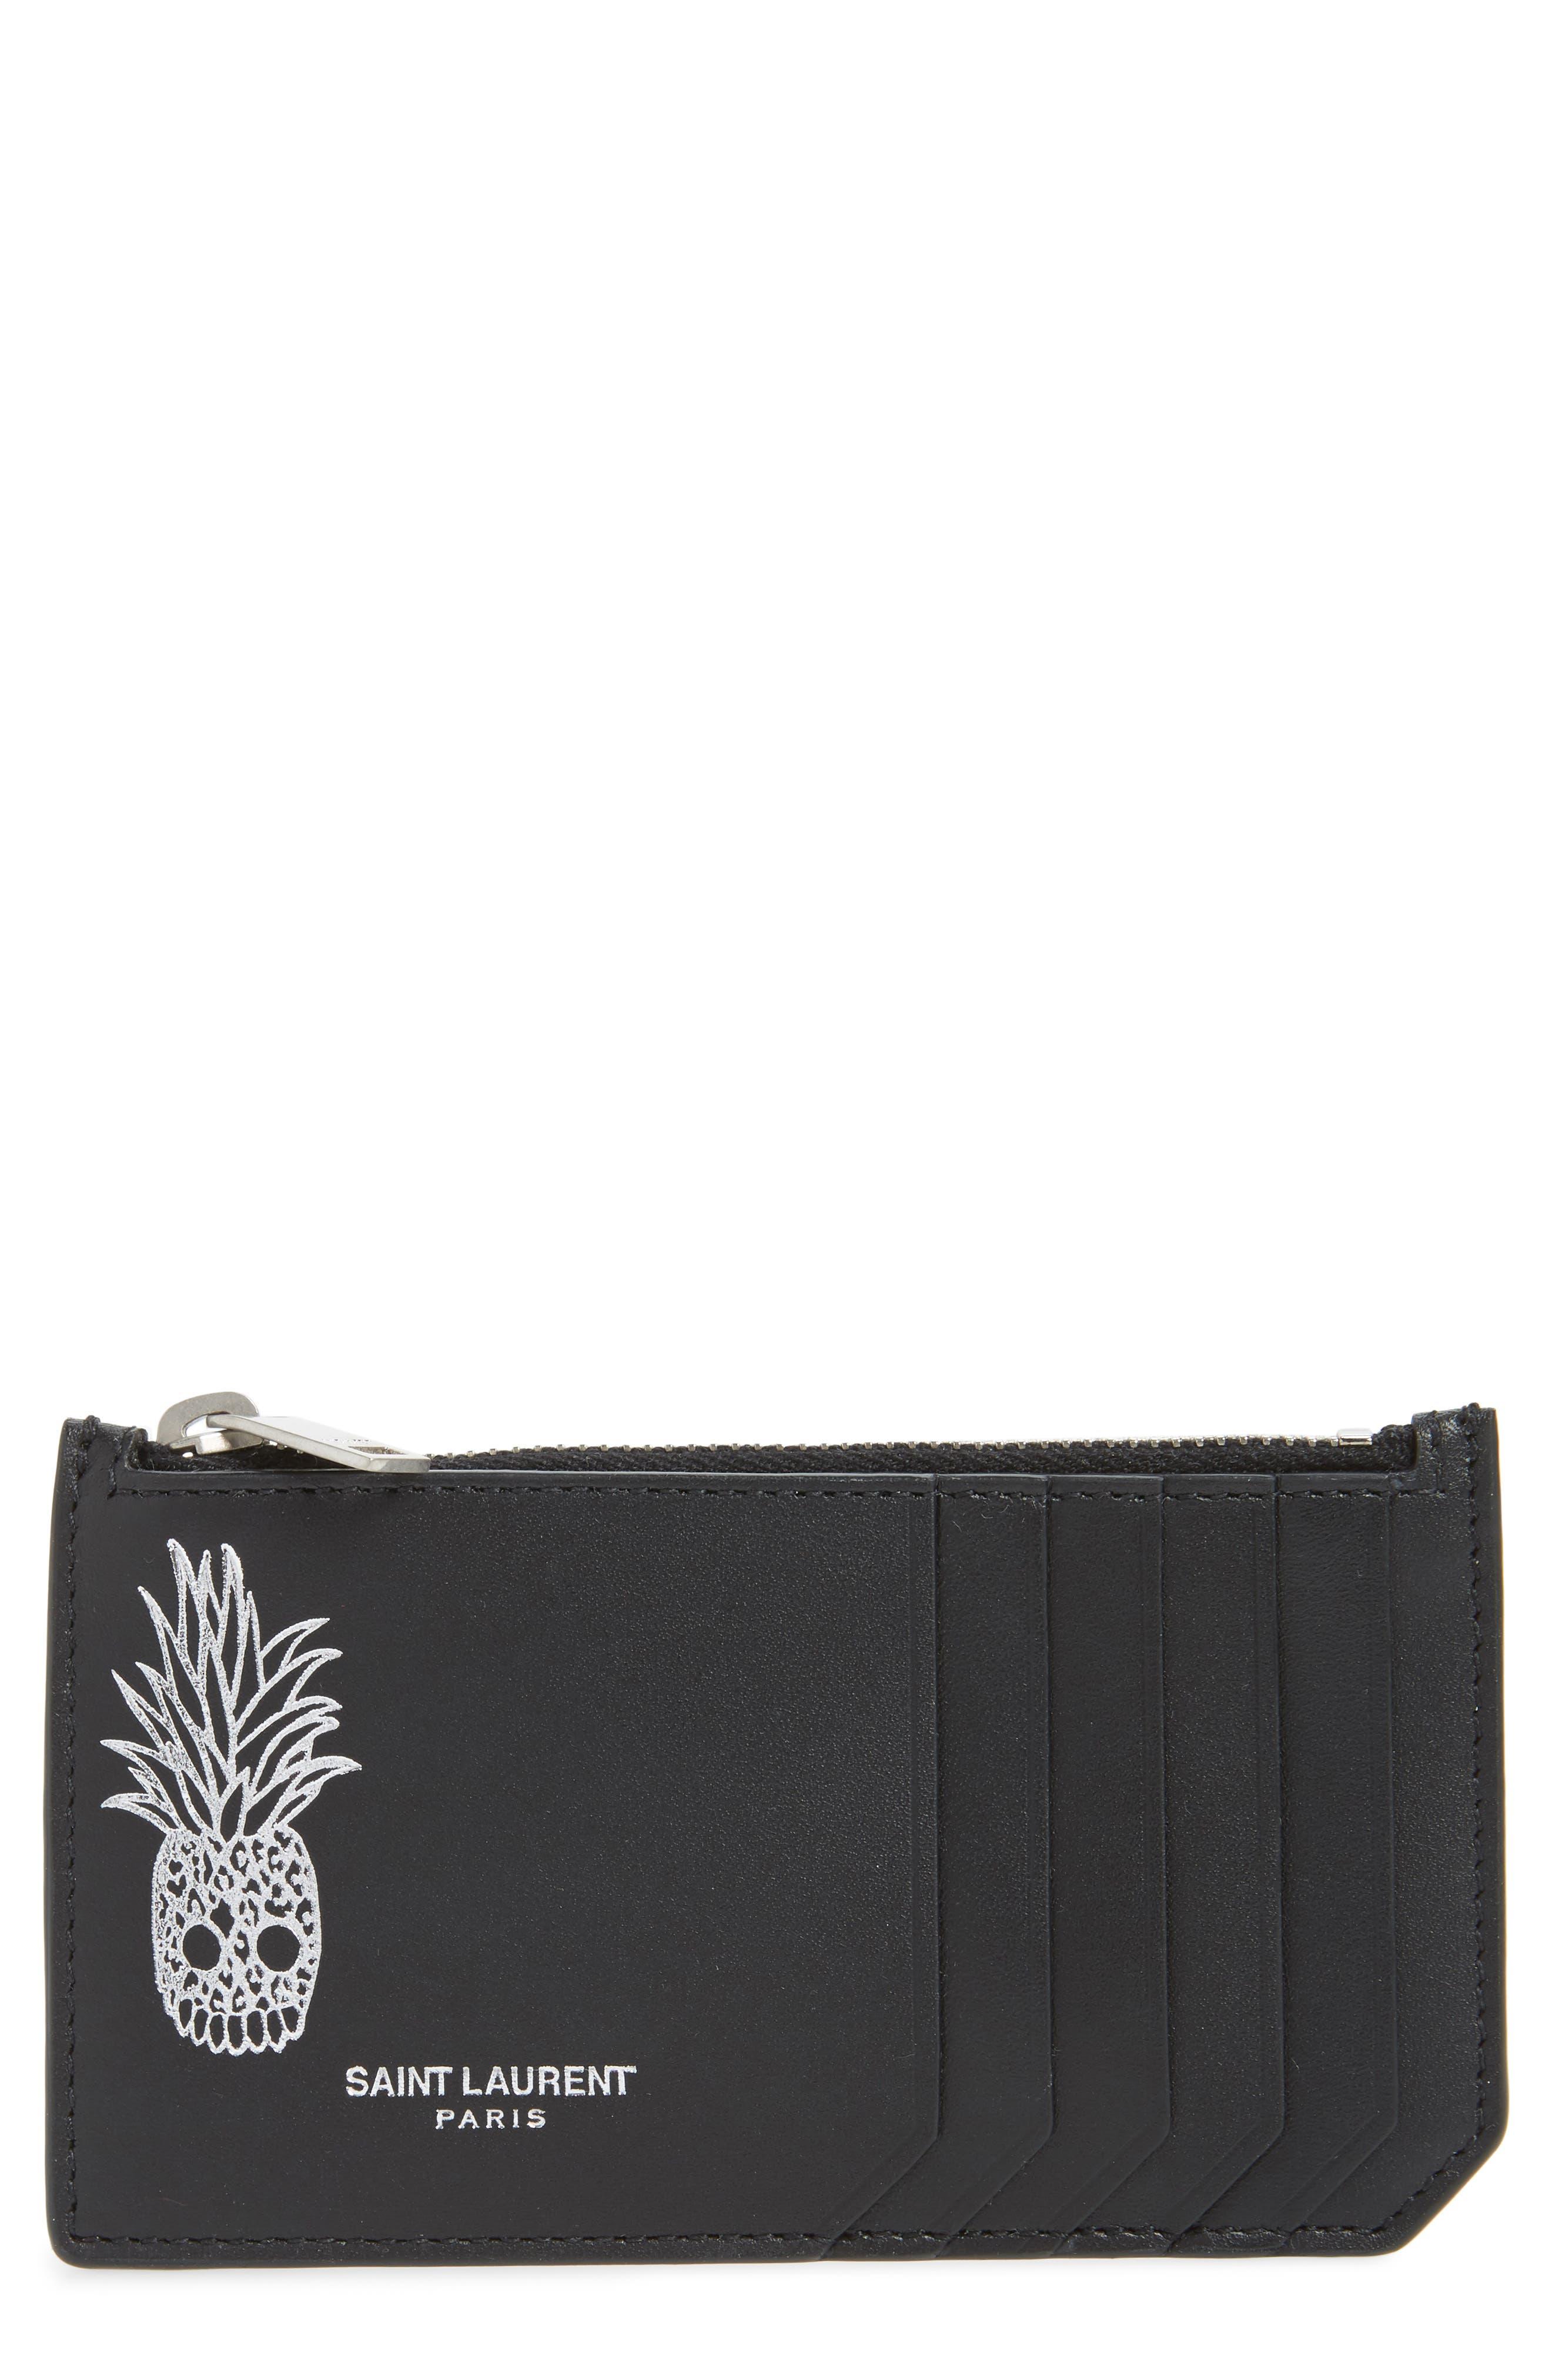 Pineapple Skull Leather Zip Card Case,                             Main thumbnail 1, color,                             BLACK